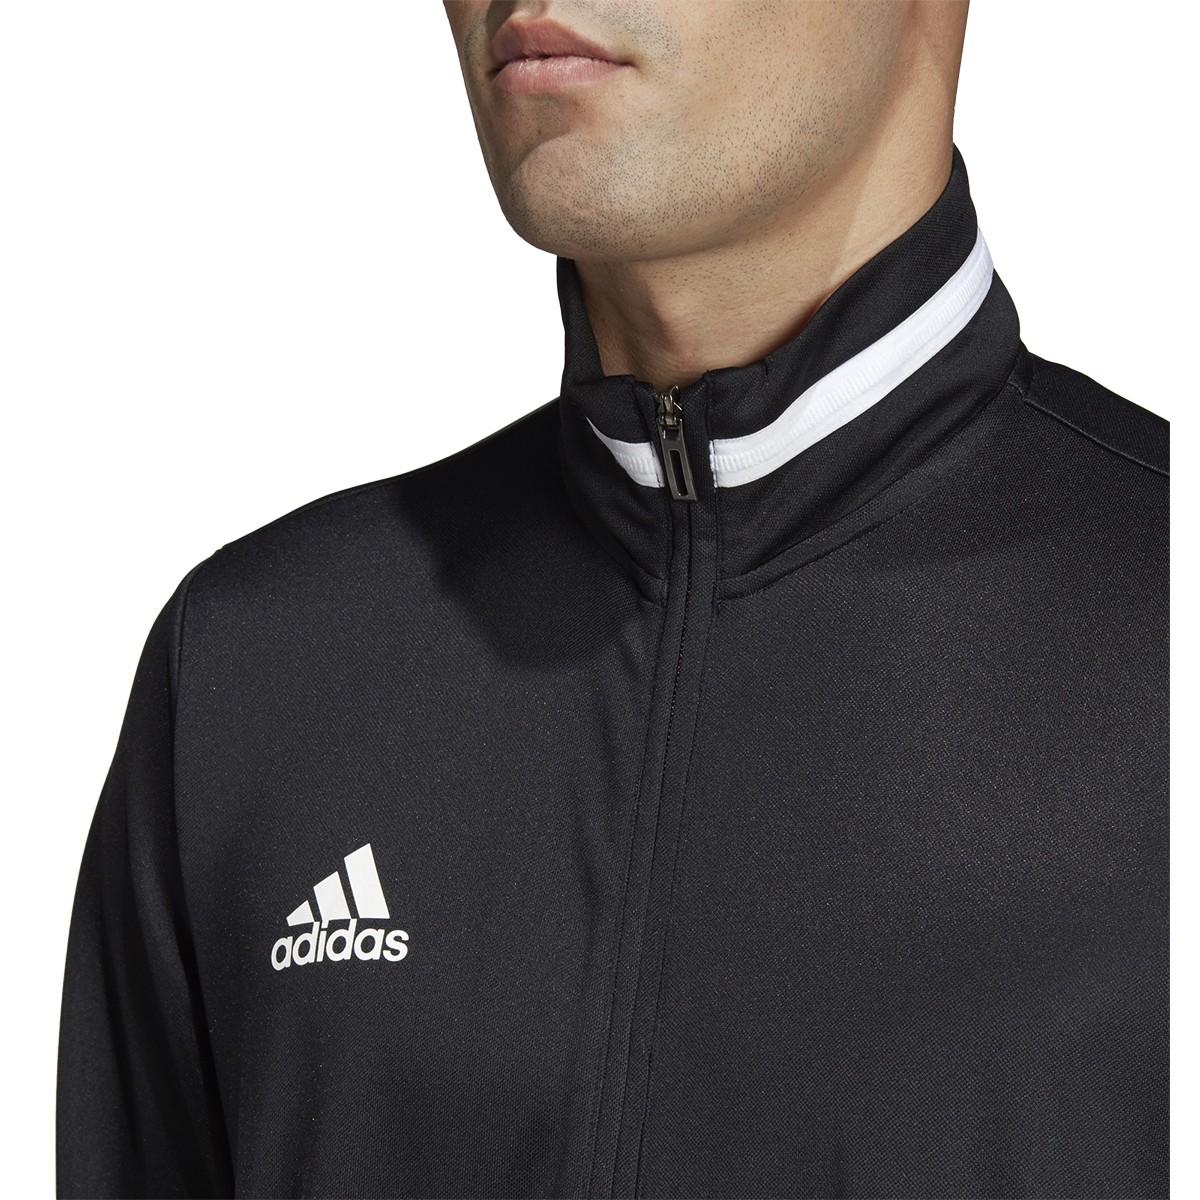 VESTE ADIDAS T19 ADIDAS Homme Vêtements | Tennispro